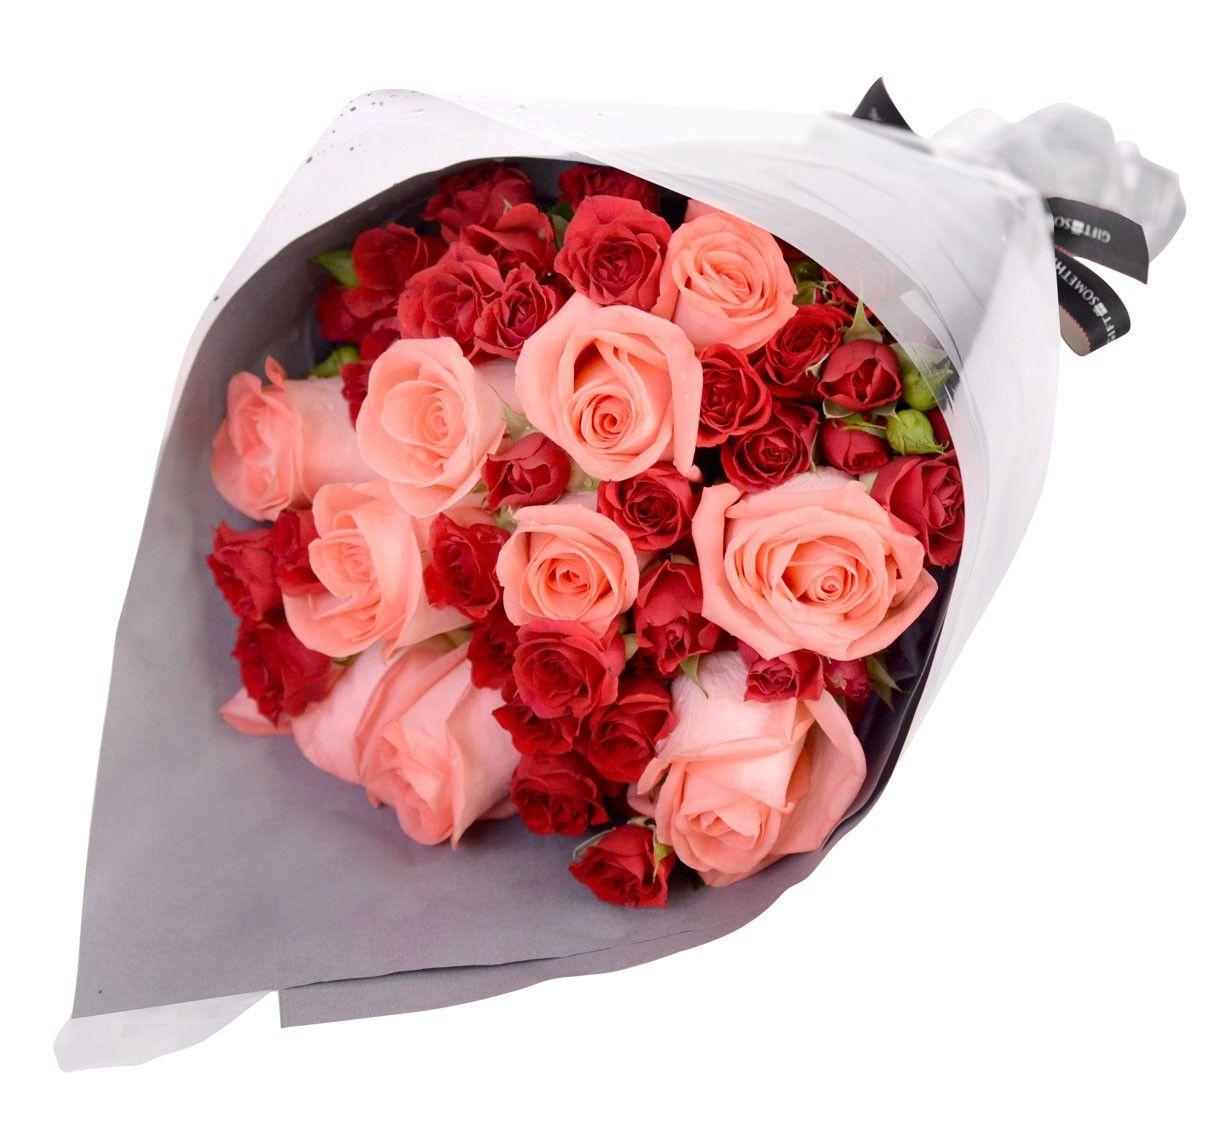 Pink Roses Mini Roses Bouquet Singapore Online Florist Online Florist Flower Delivery Mini Roses